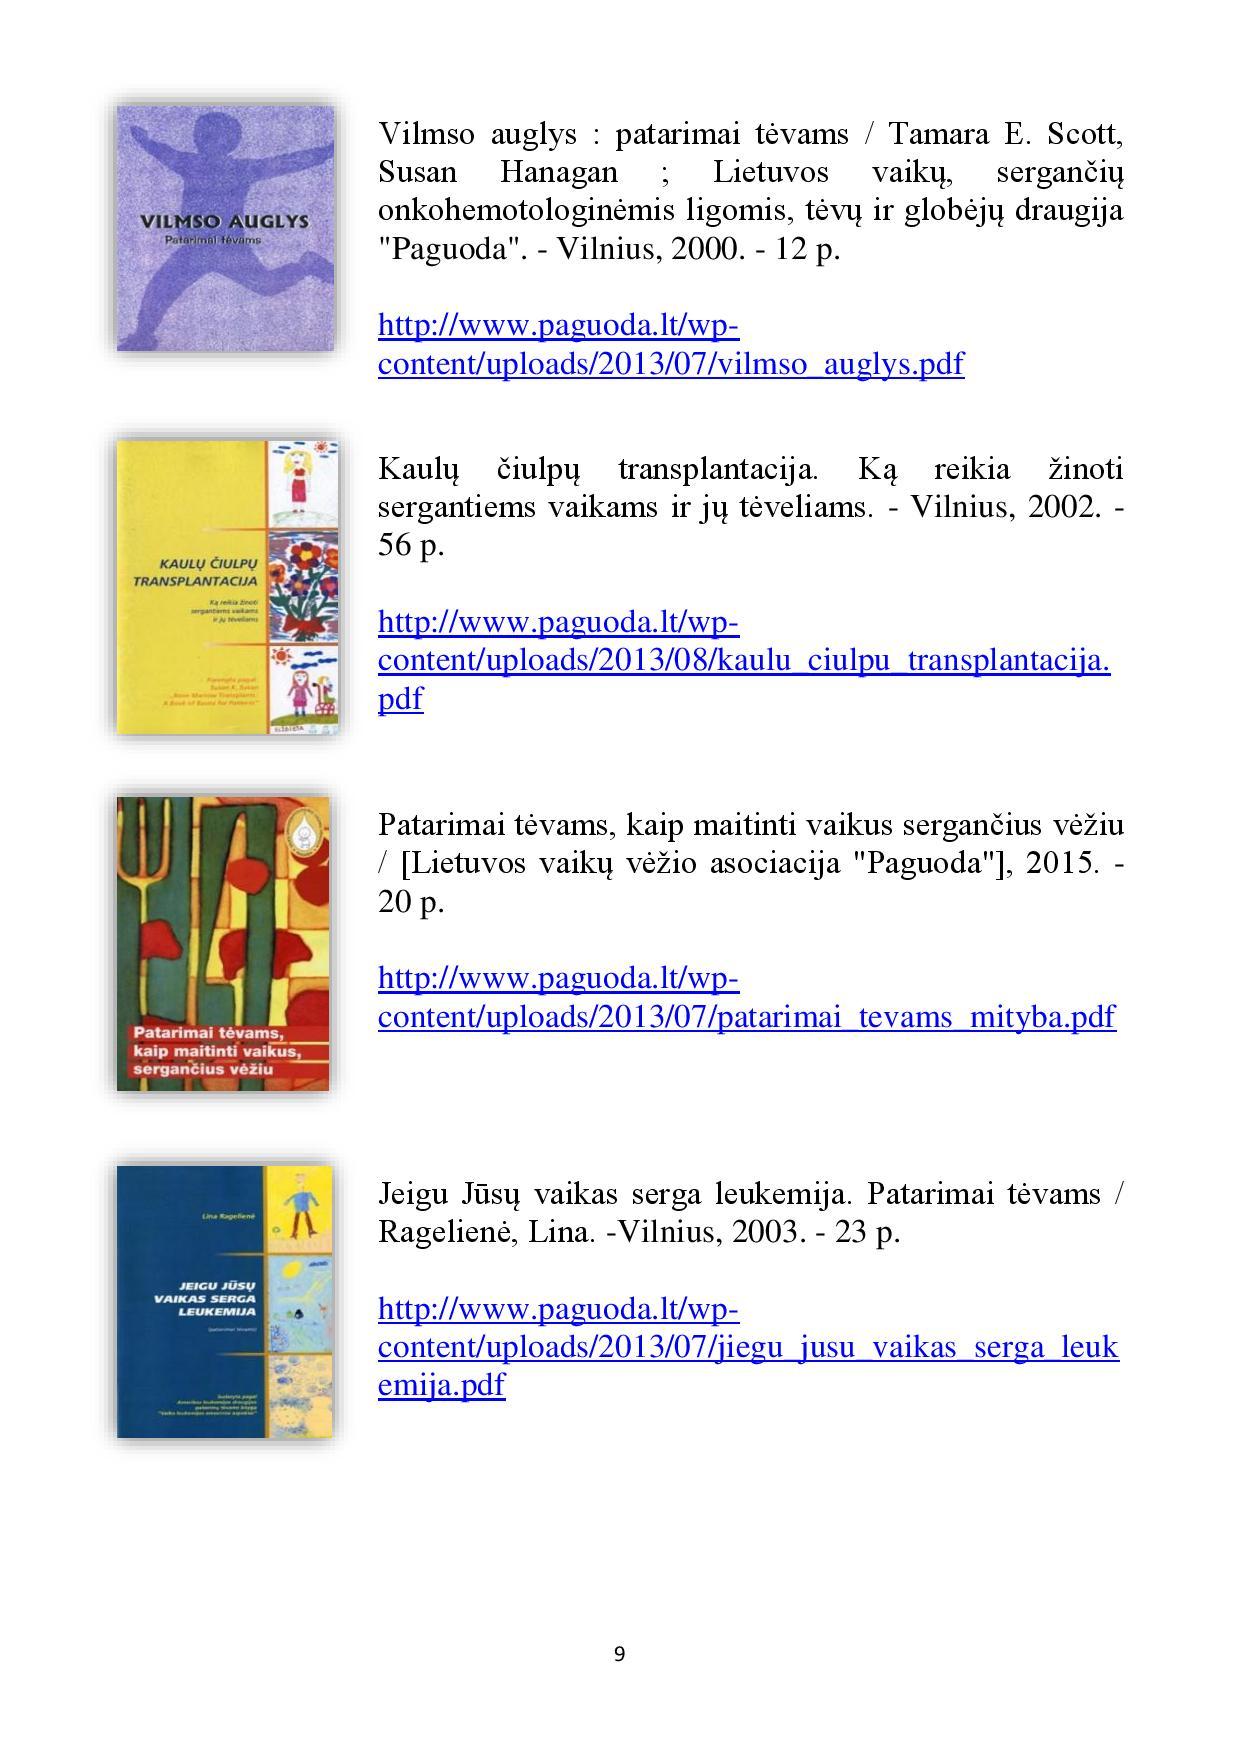 Sergantiems onkologinėmis ligomis -page-009